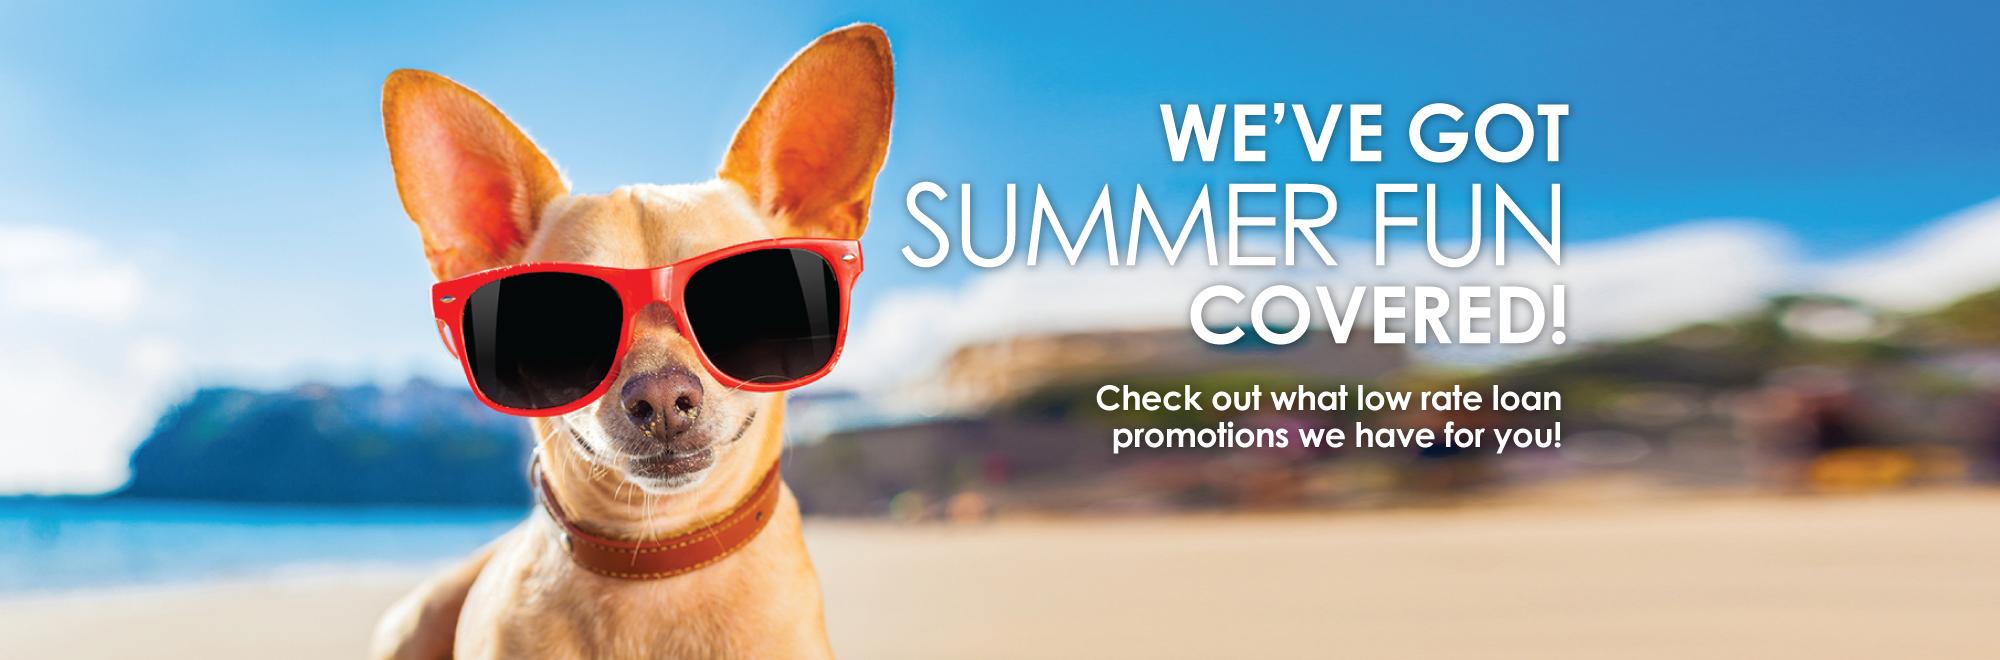 Summer fun vacation loan banner image